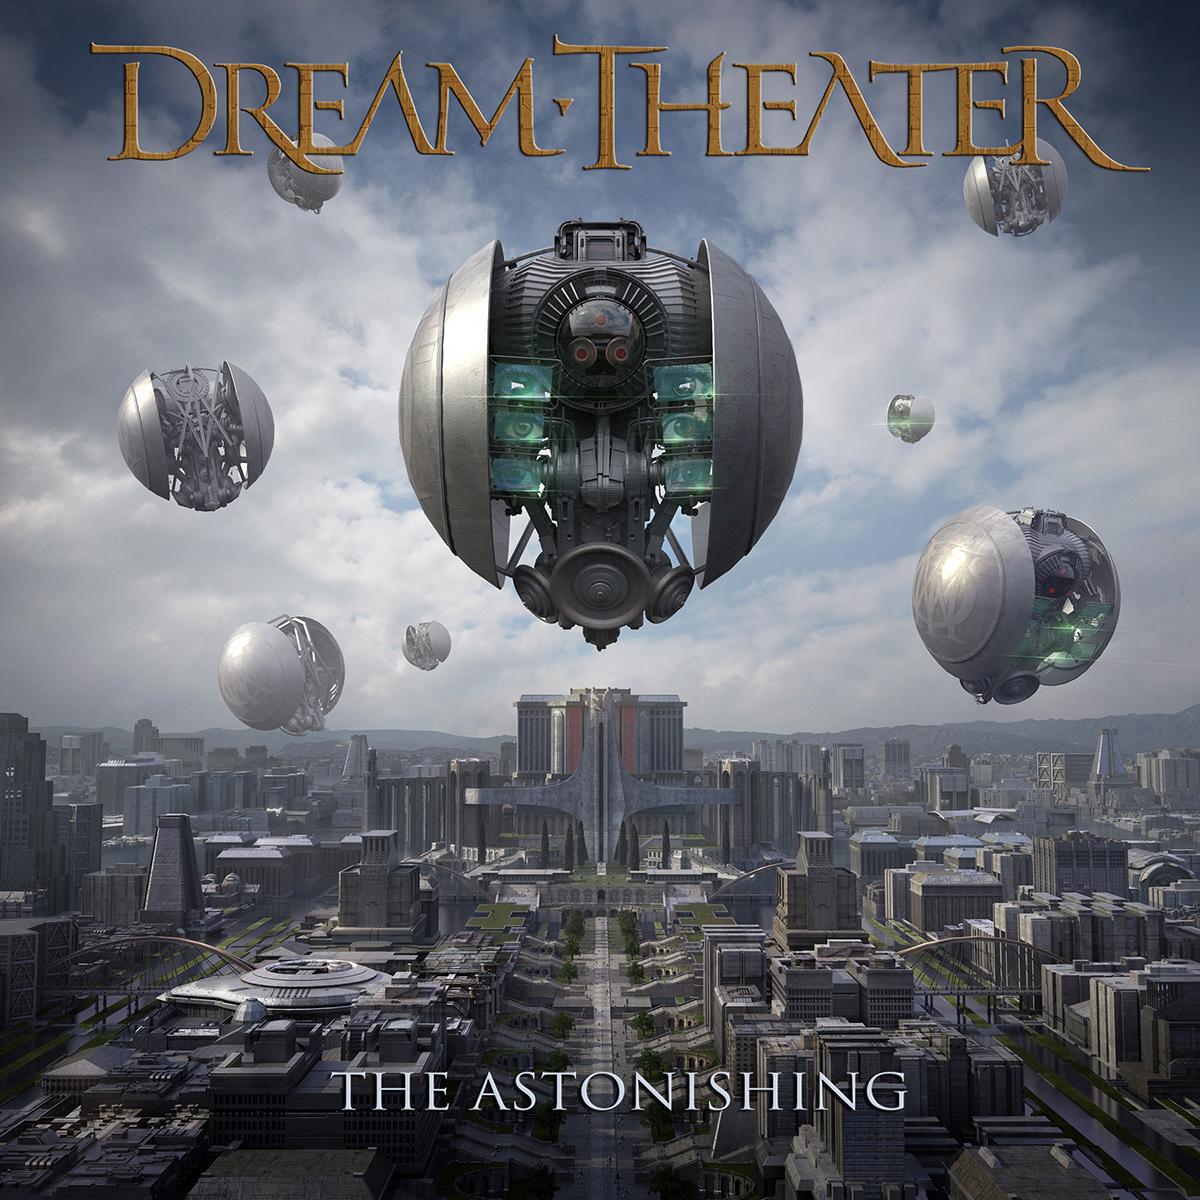 The Astonishing – The Dream Theater World